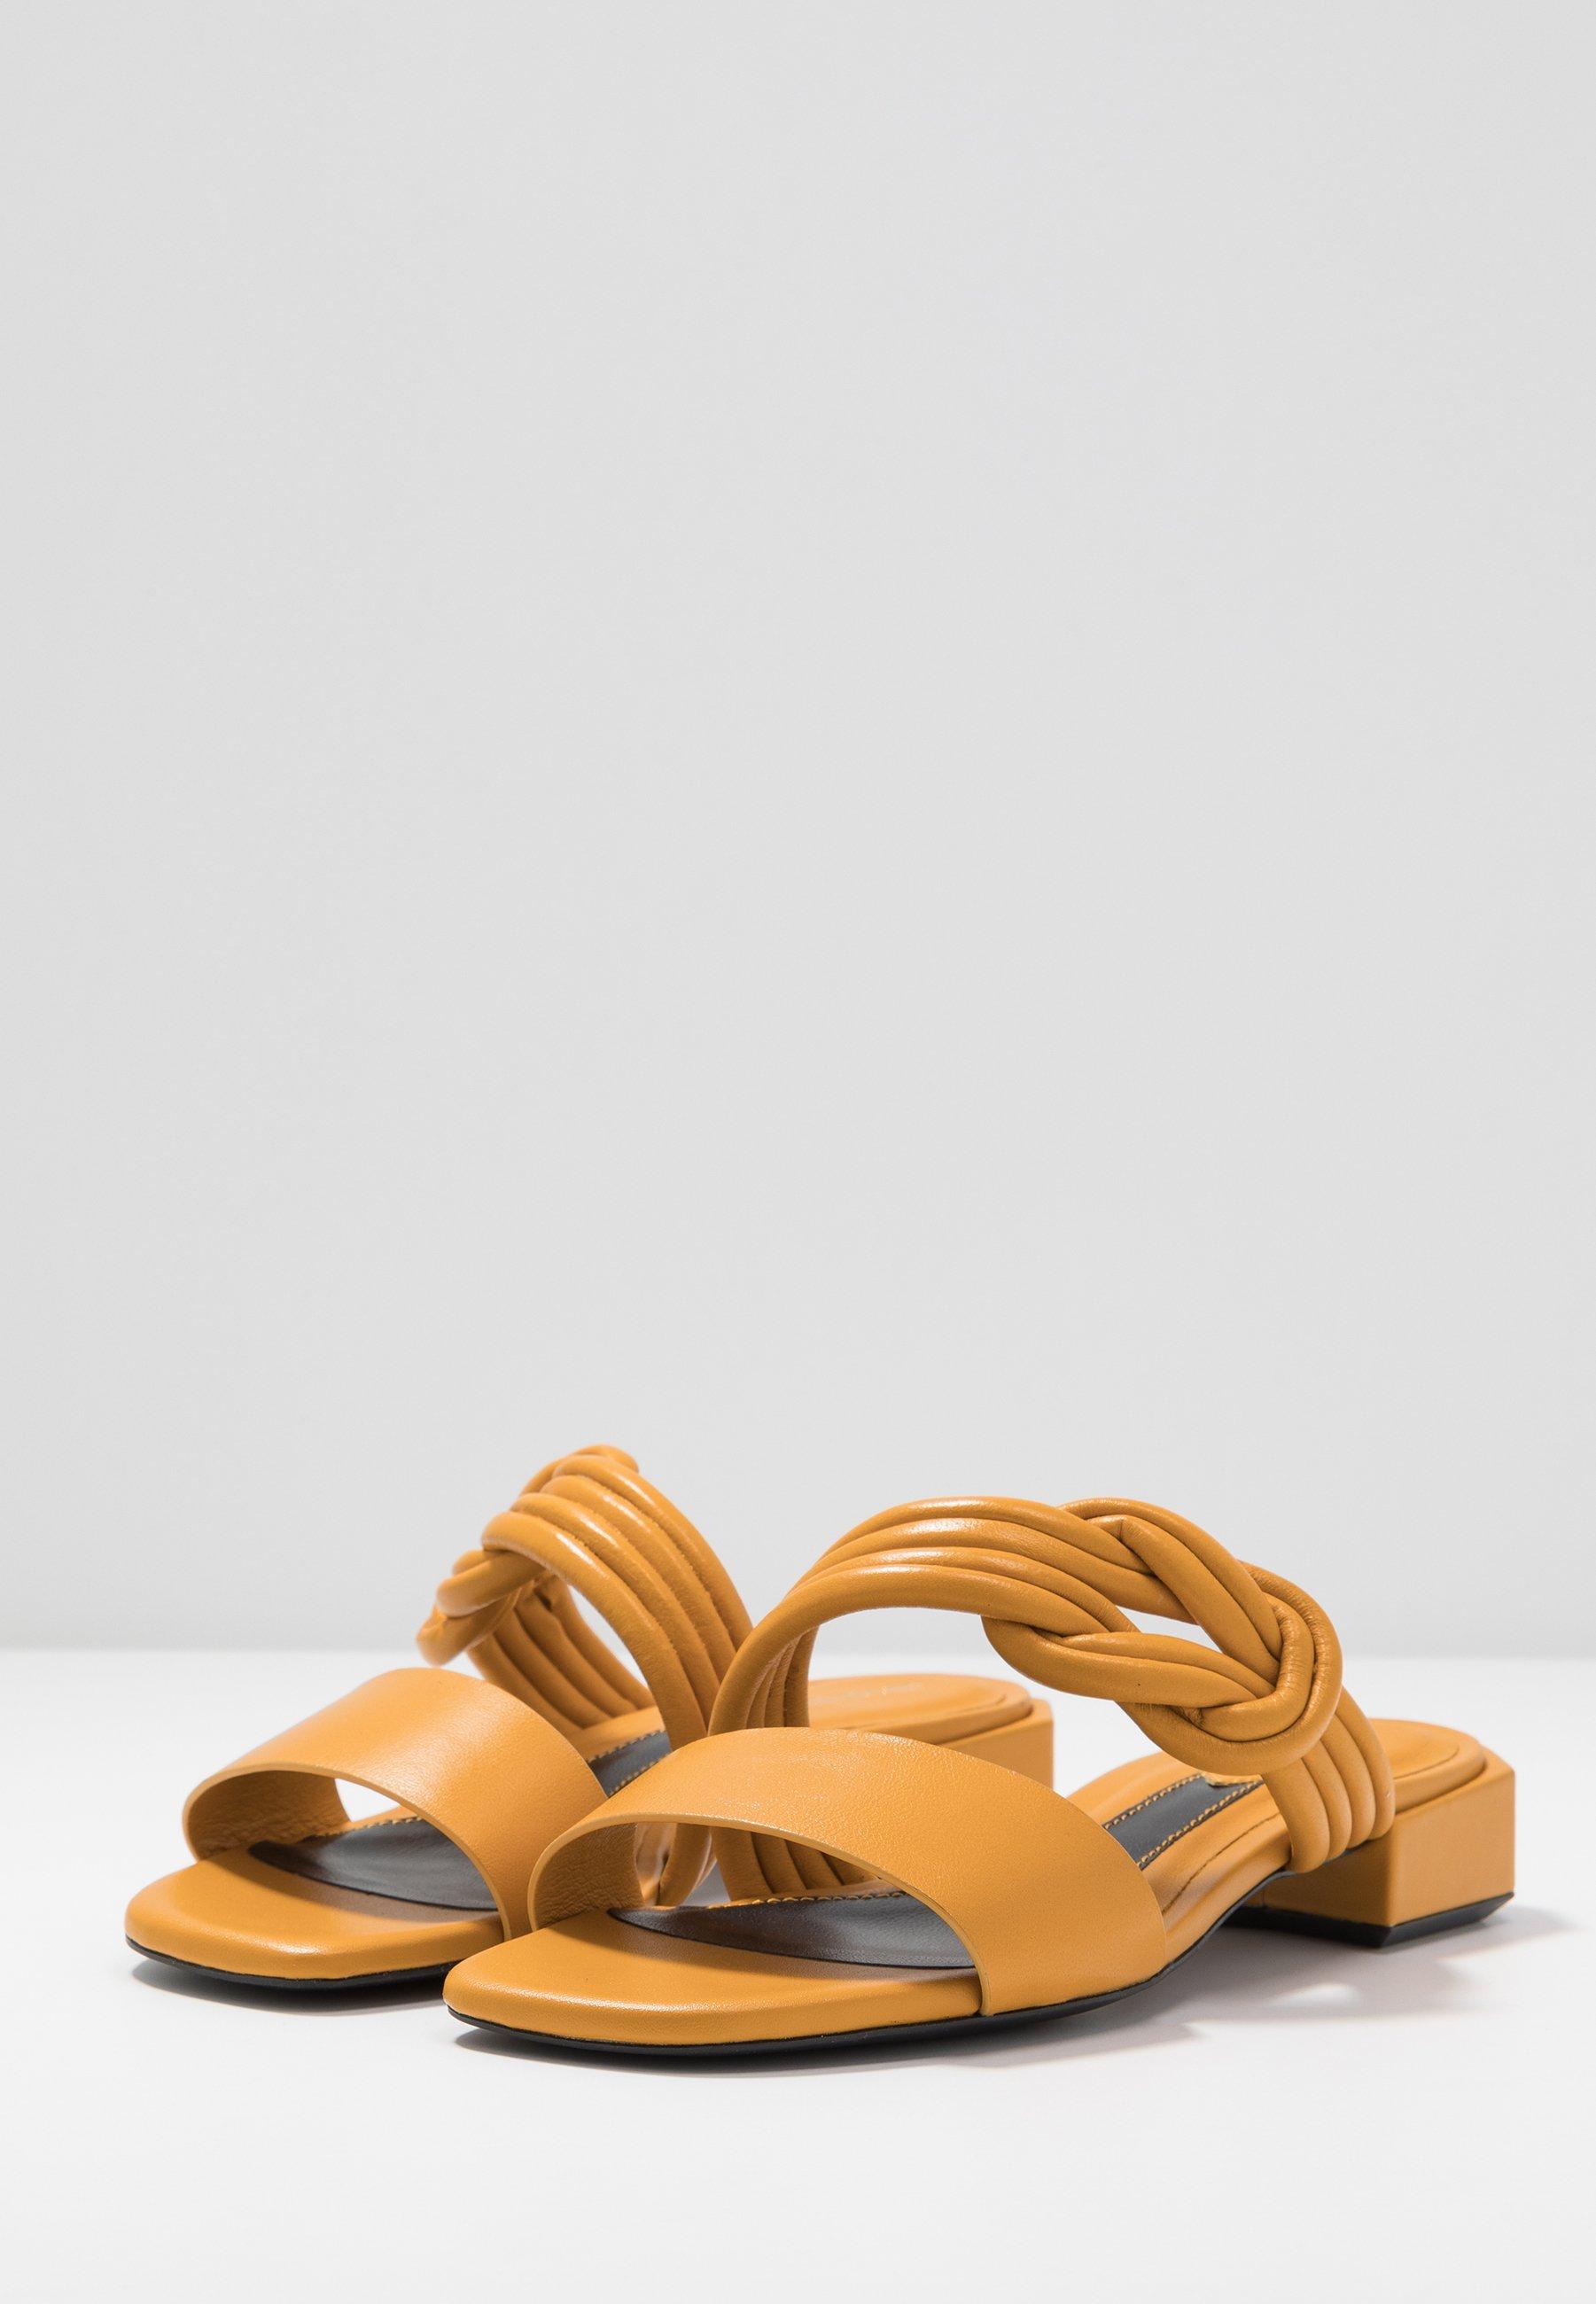 Bruno Premi Slip-ins - yellow